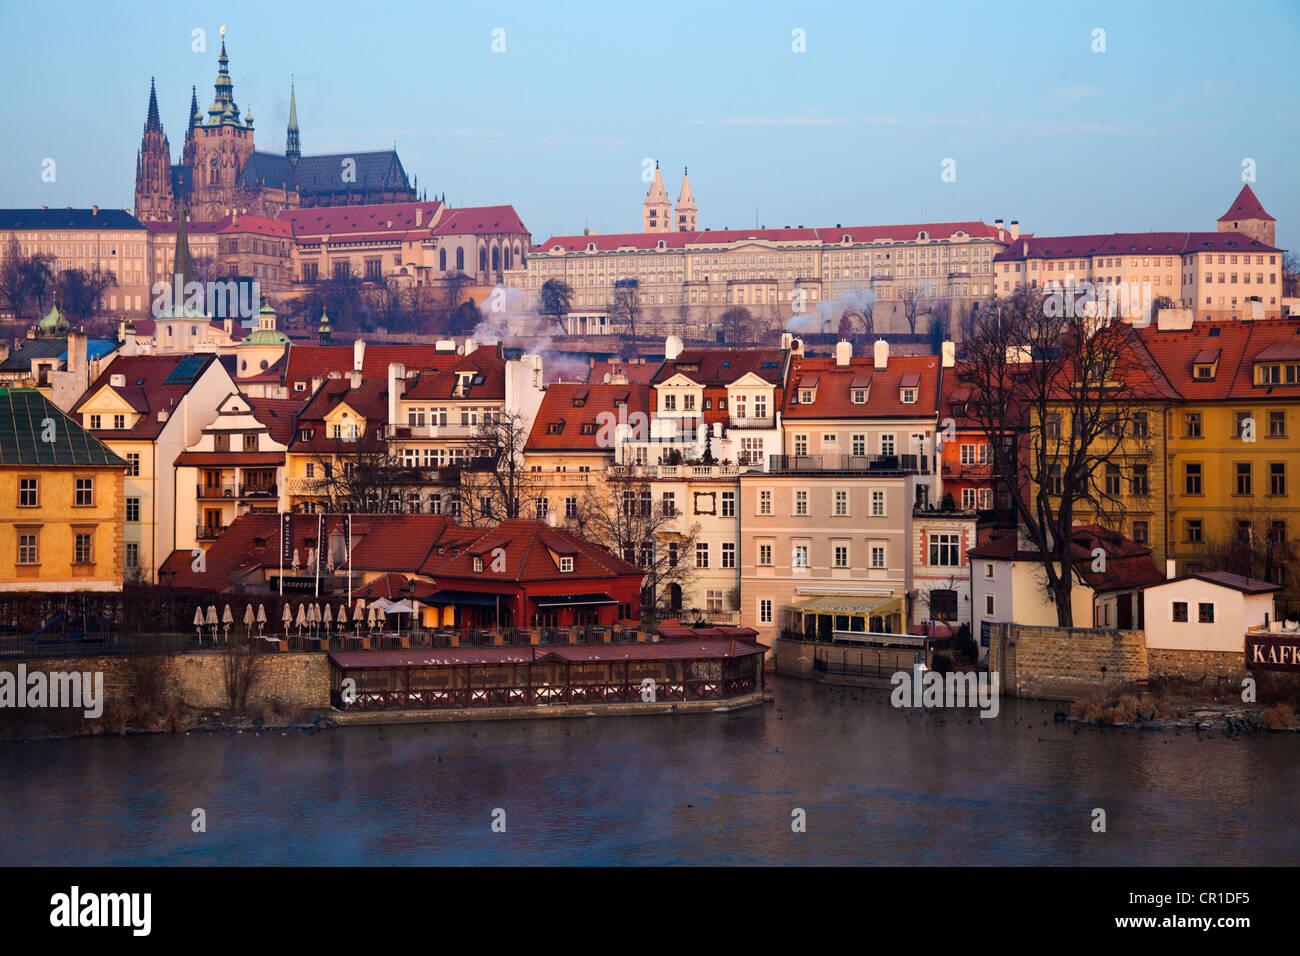 Czech Republic, Prague, View over Vltava River towards Prague Castle in early morning - Stock Image